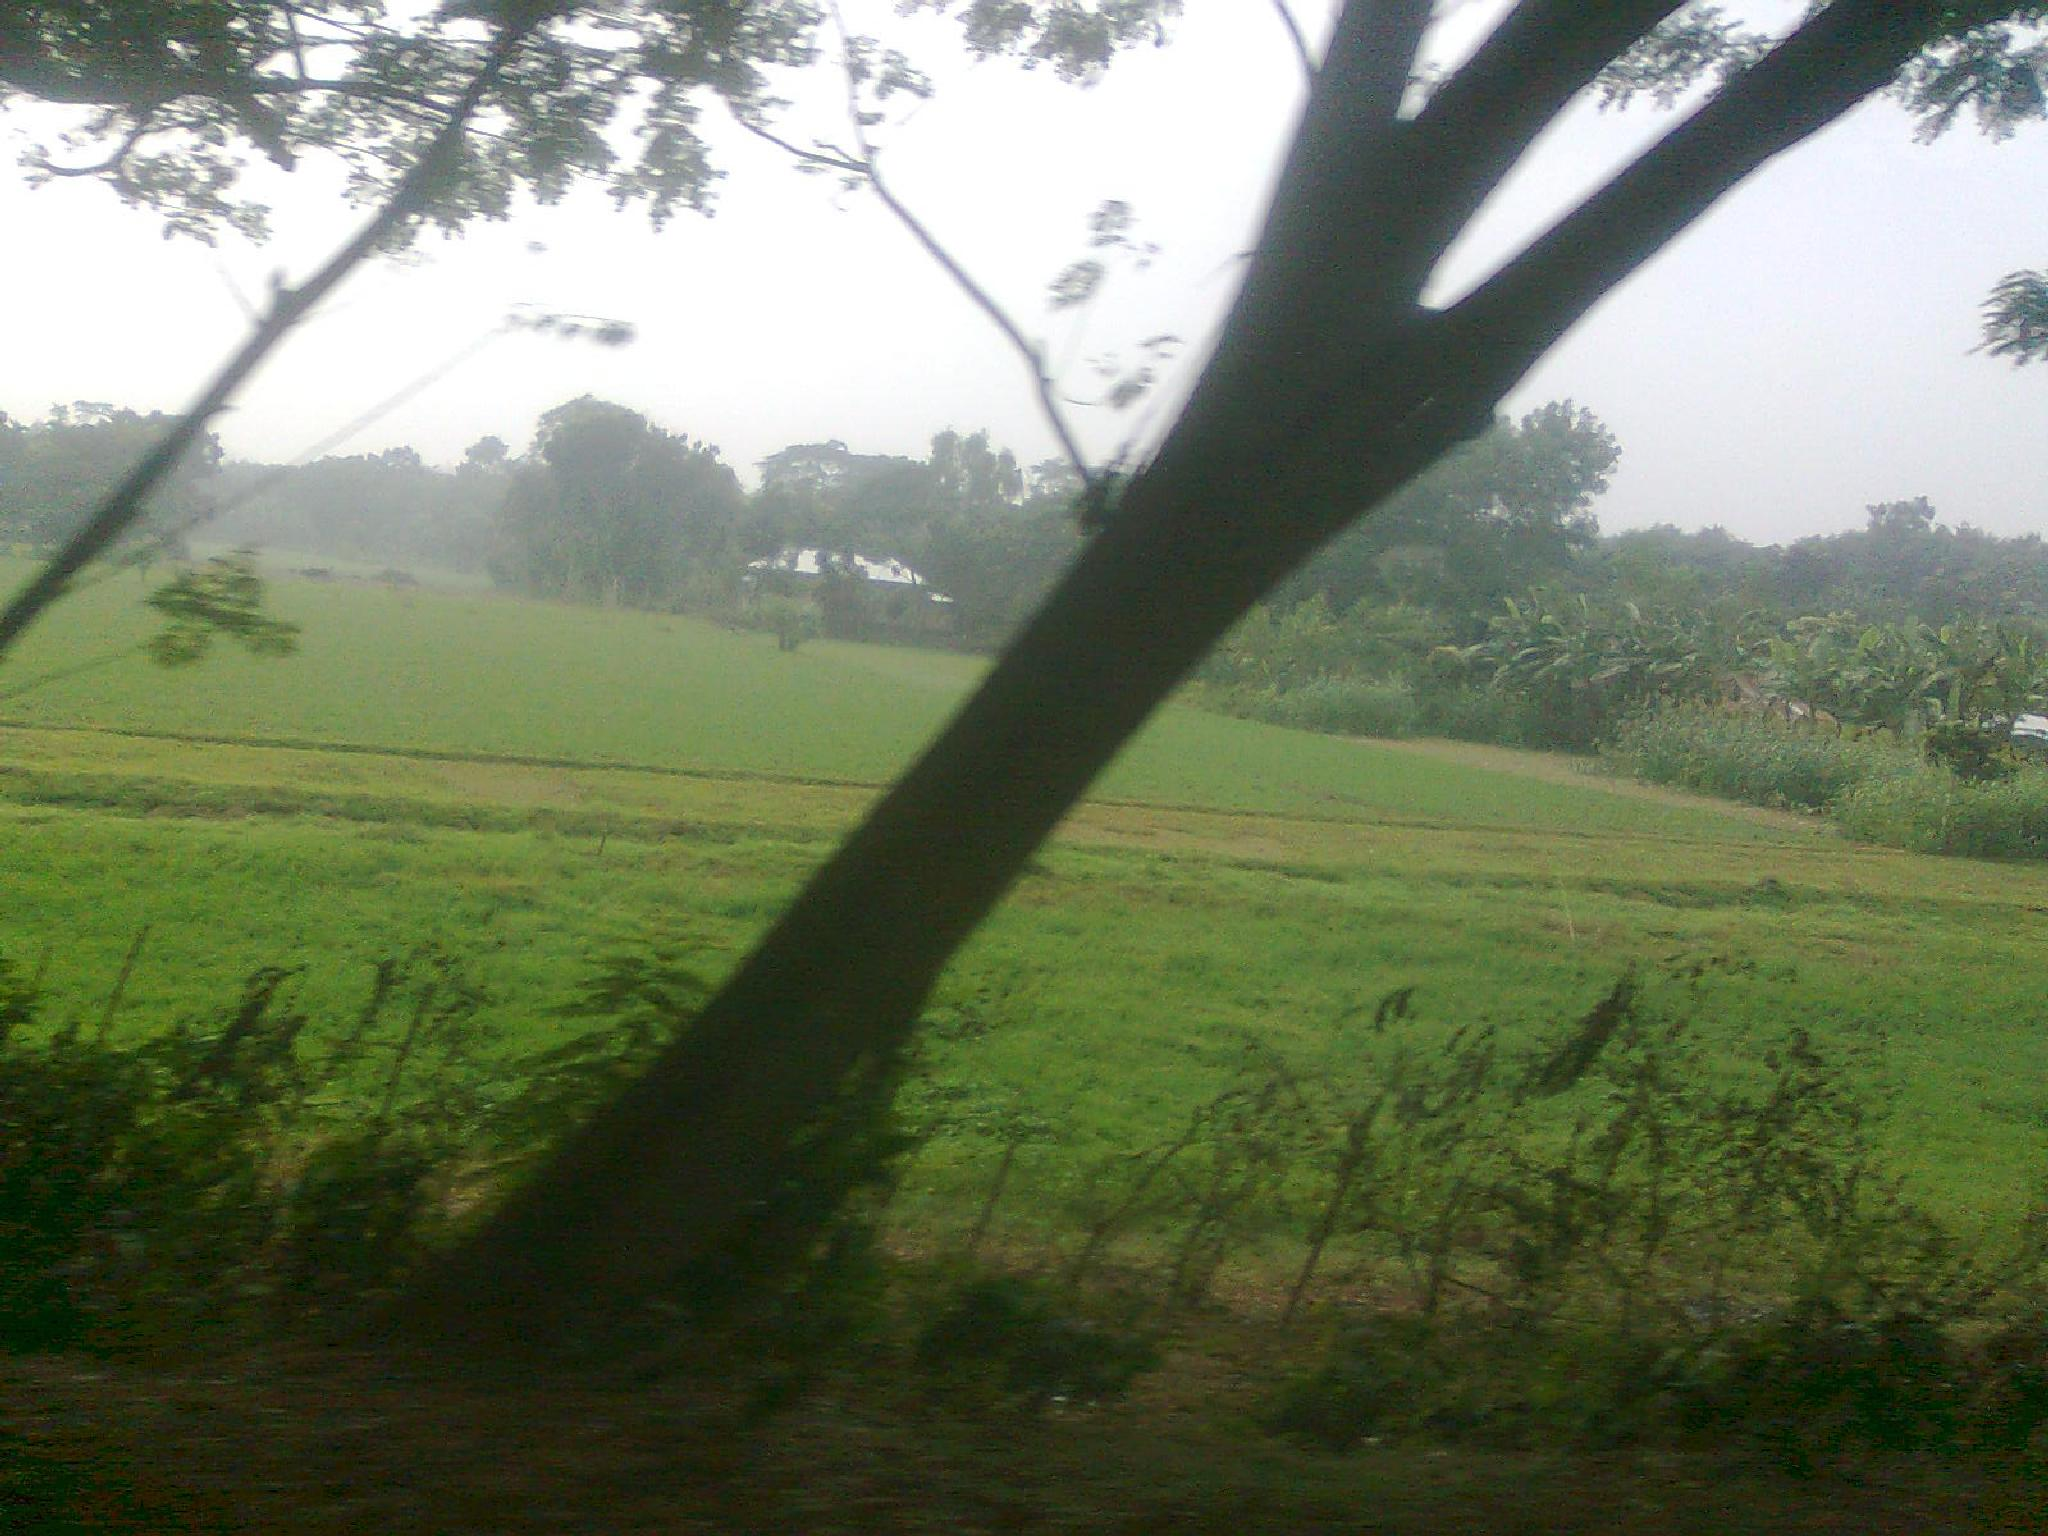 Village of Bangladesh by akhtarudduza